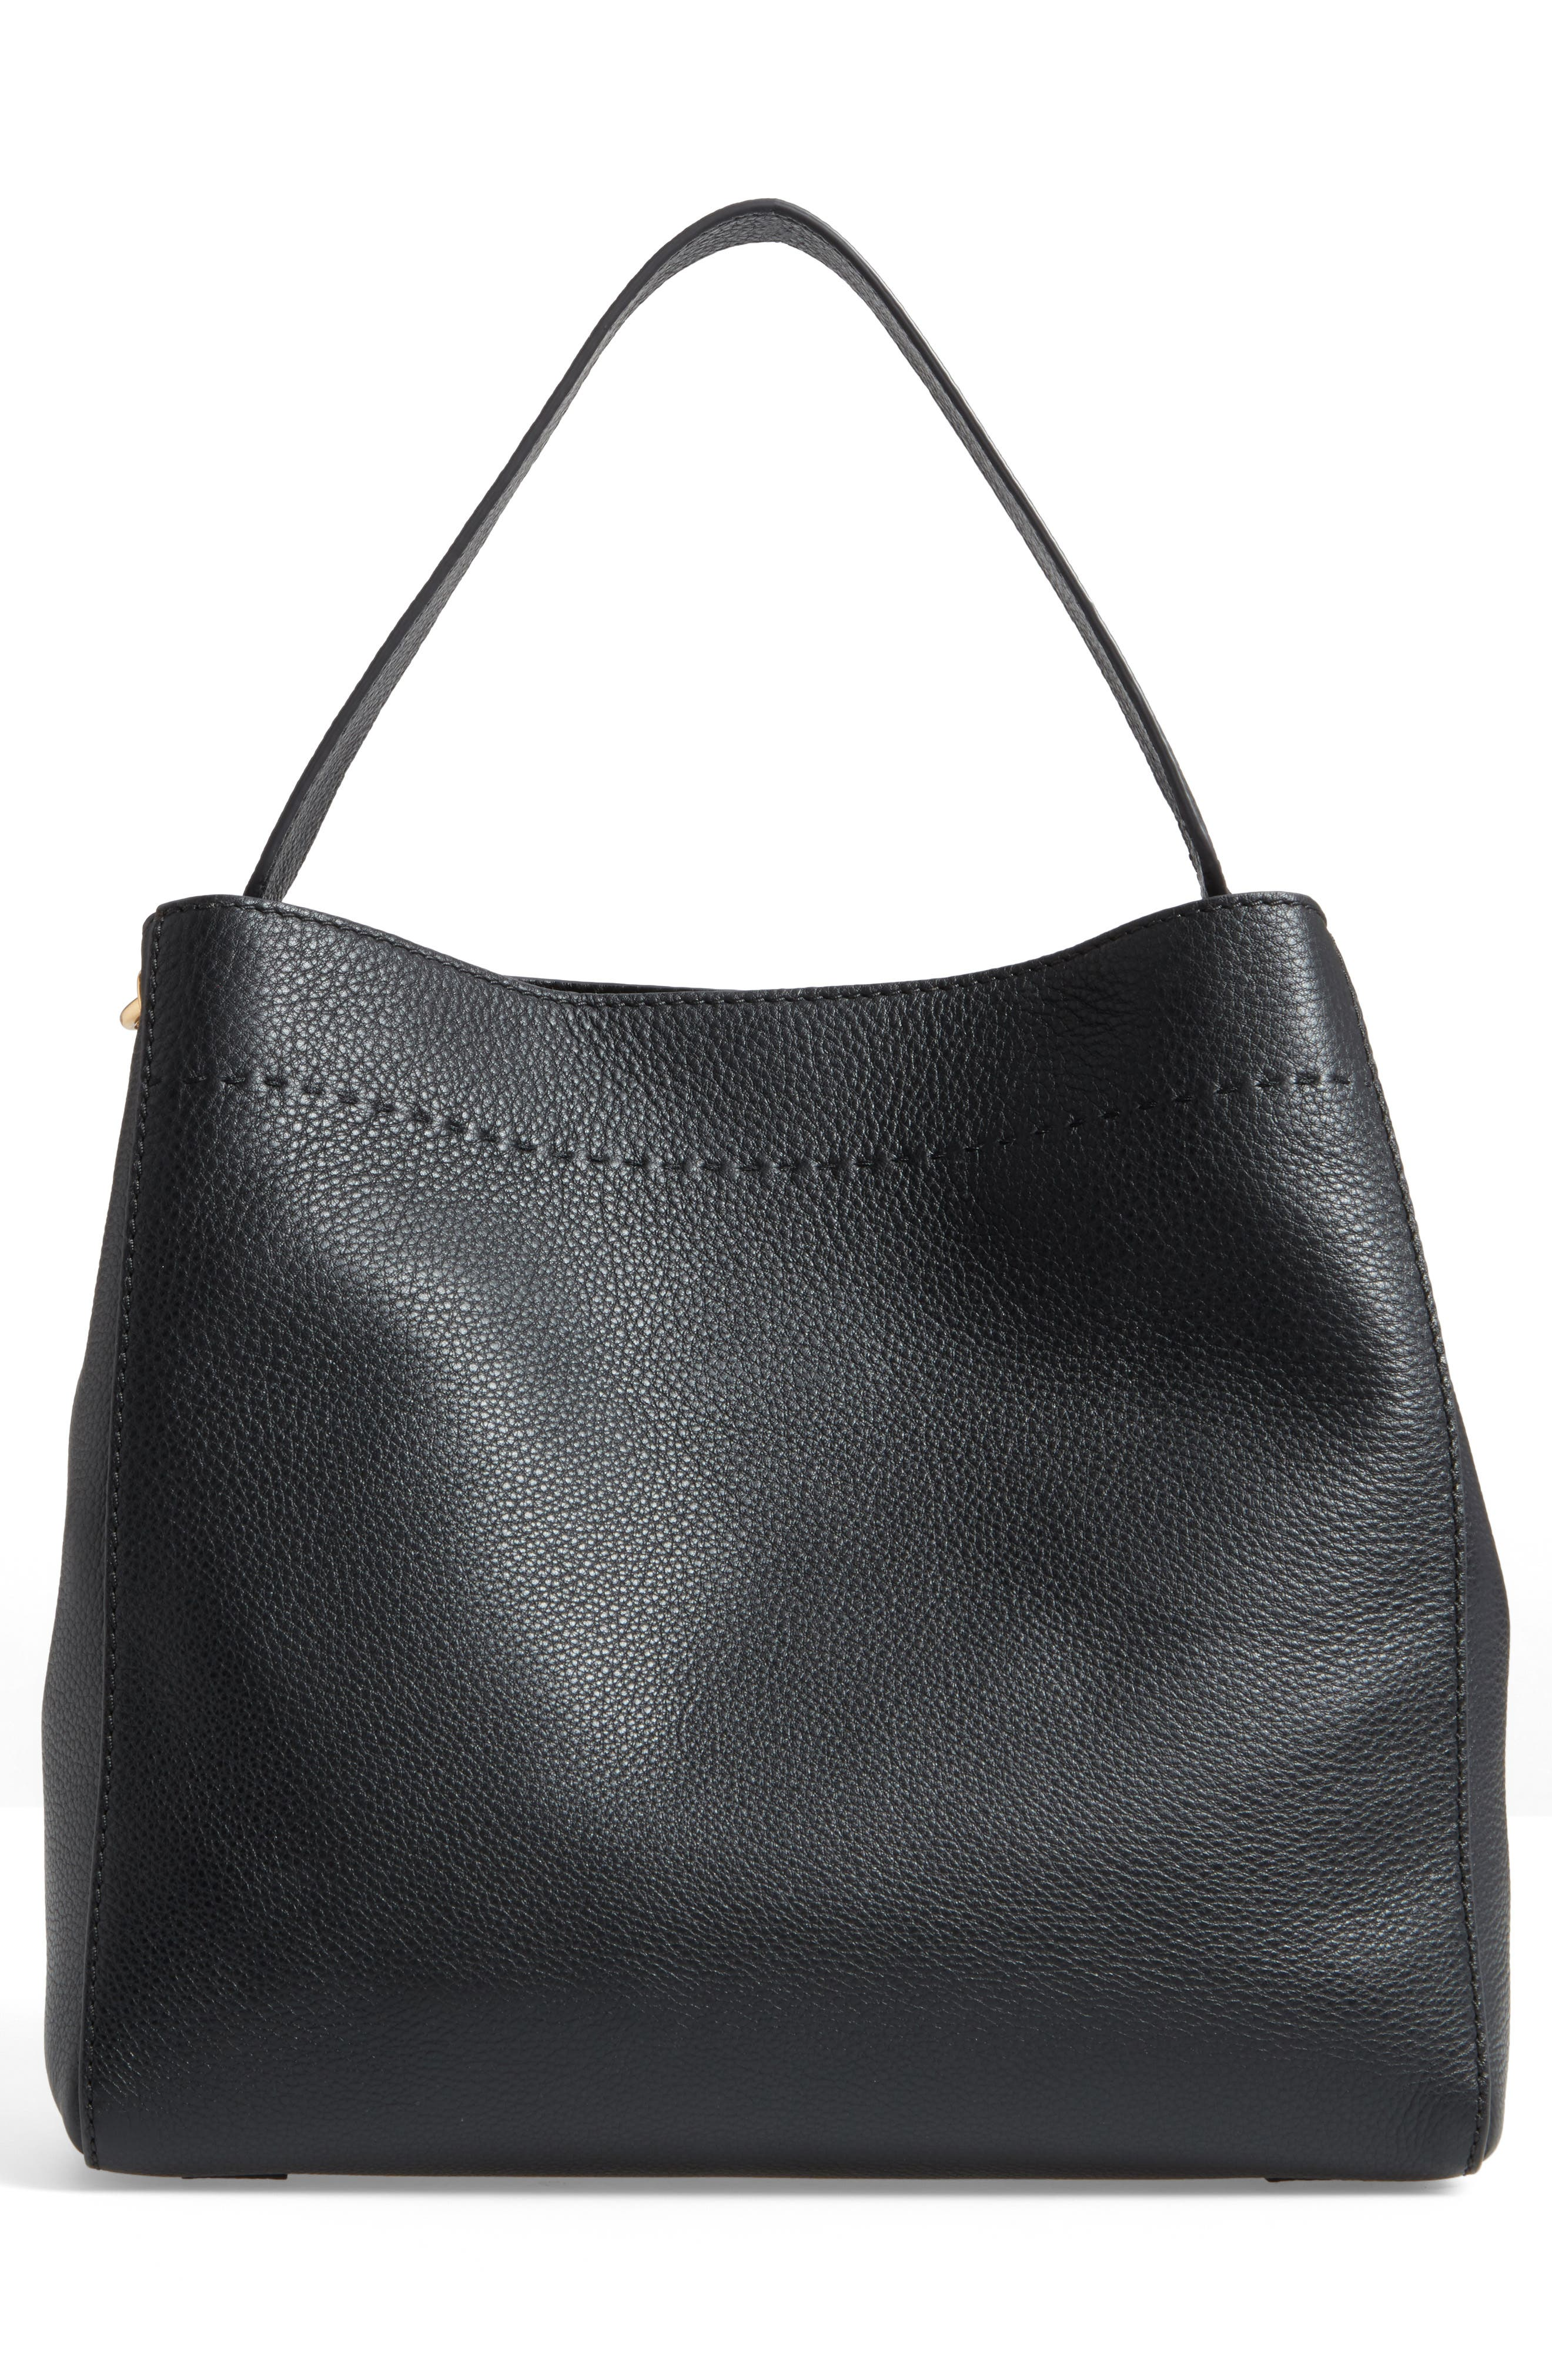 McGraw Leather Hobo,                             Alternate thumbnail 3, color,                             BLACK